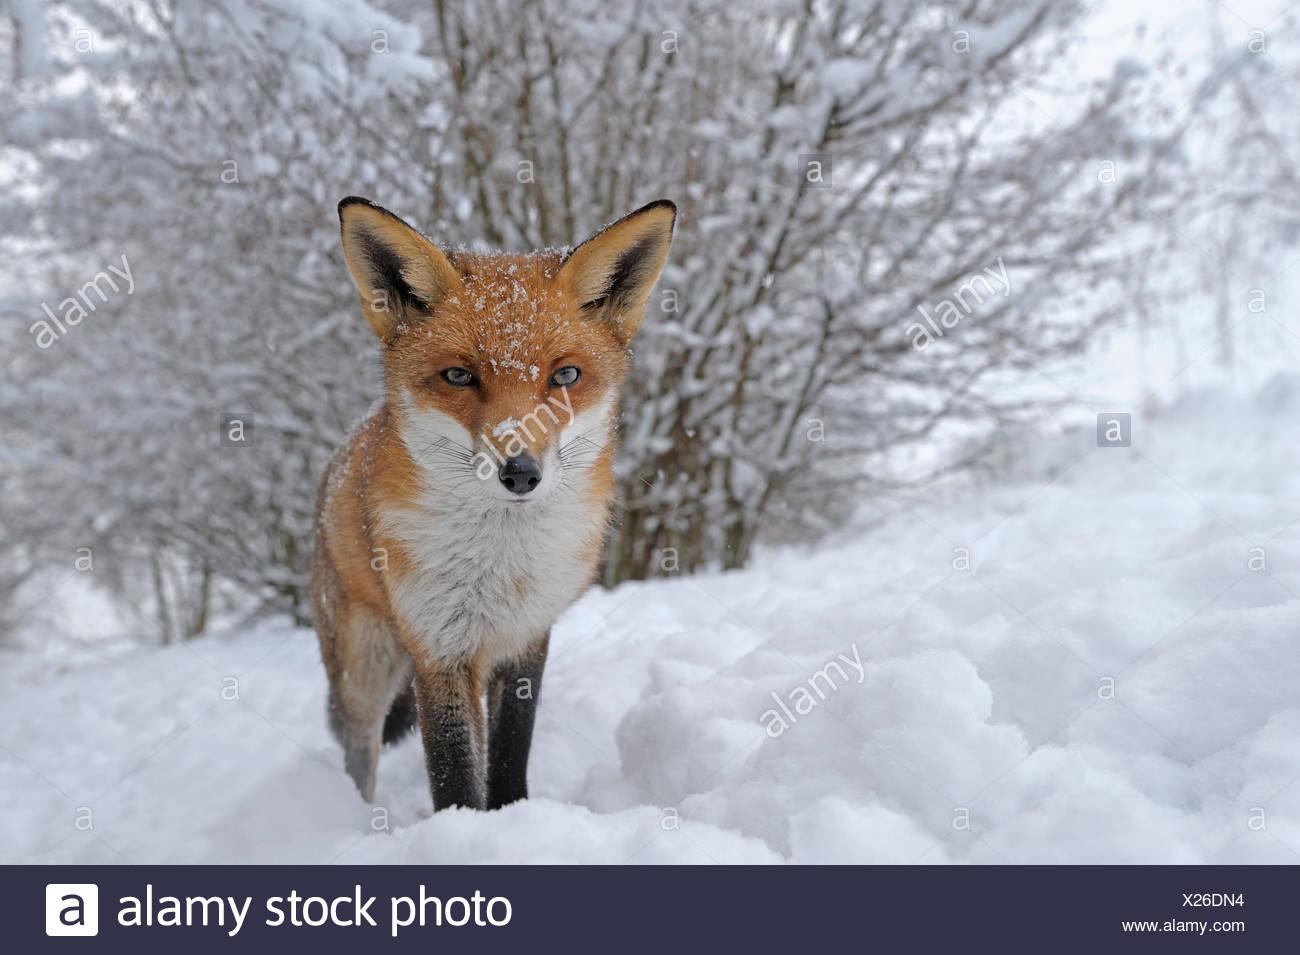 European Red Fox (Vulpes vulpes) in snow, UK, captive - Stock Image